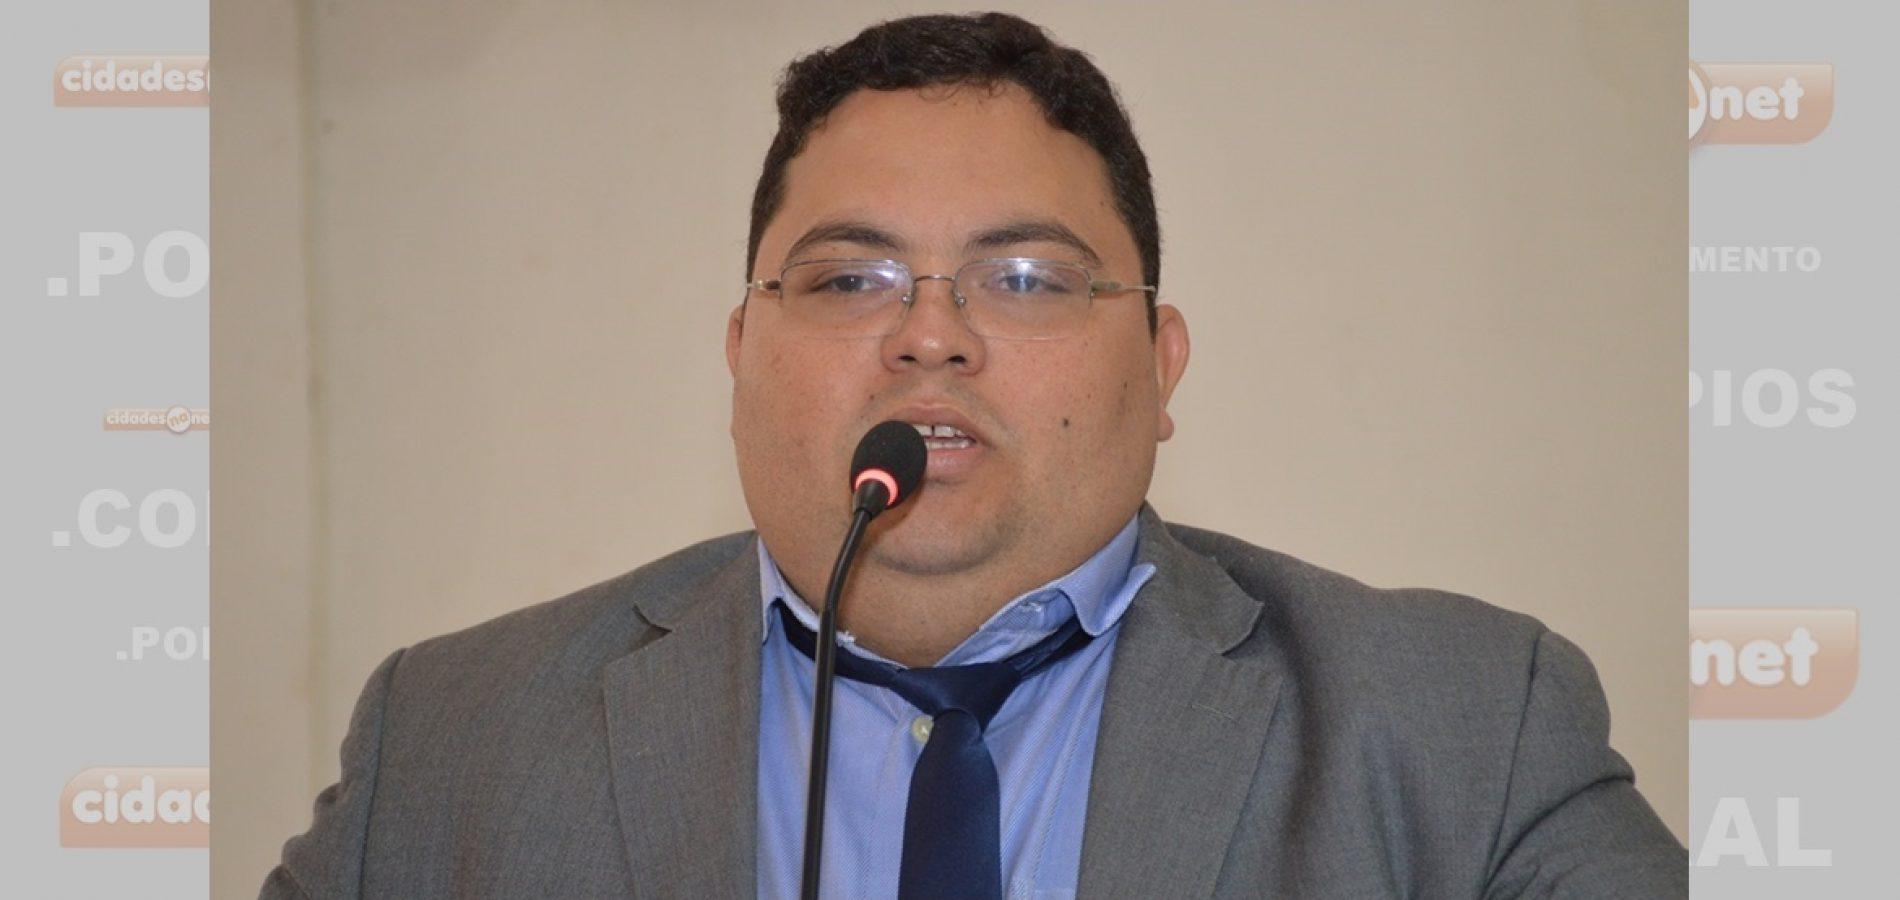 Vereadores de Picos se encontram com candidato Luciano Nunes